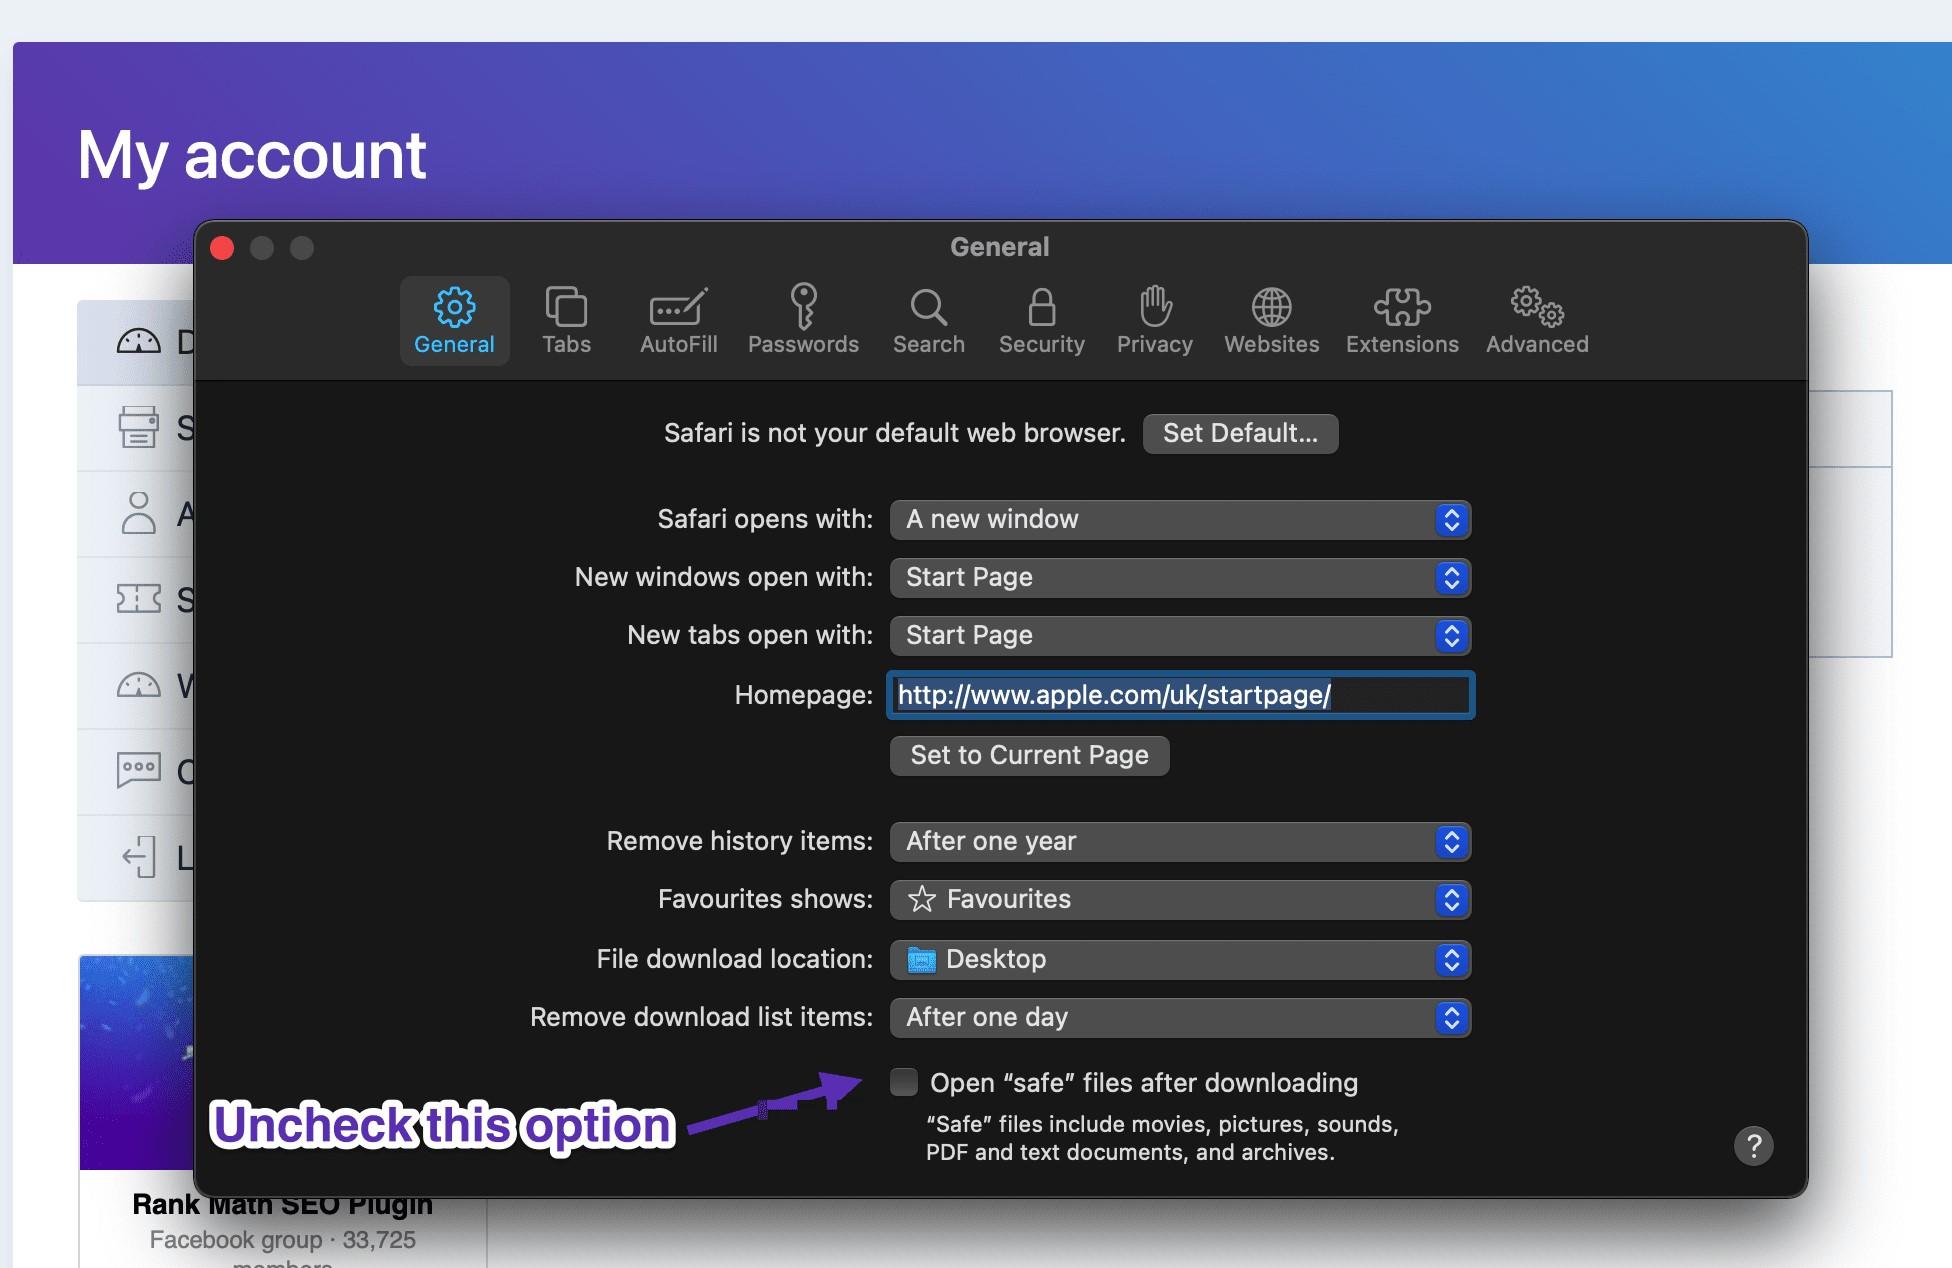 Uncheck 'safe' files option